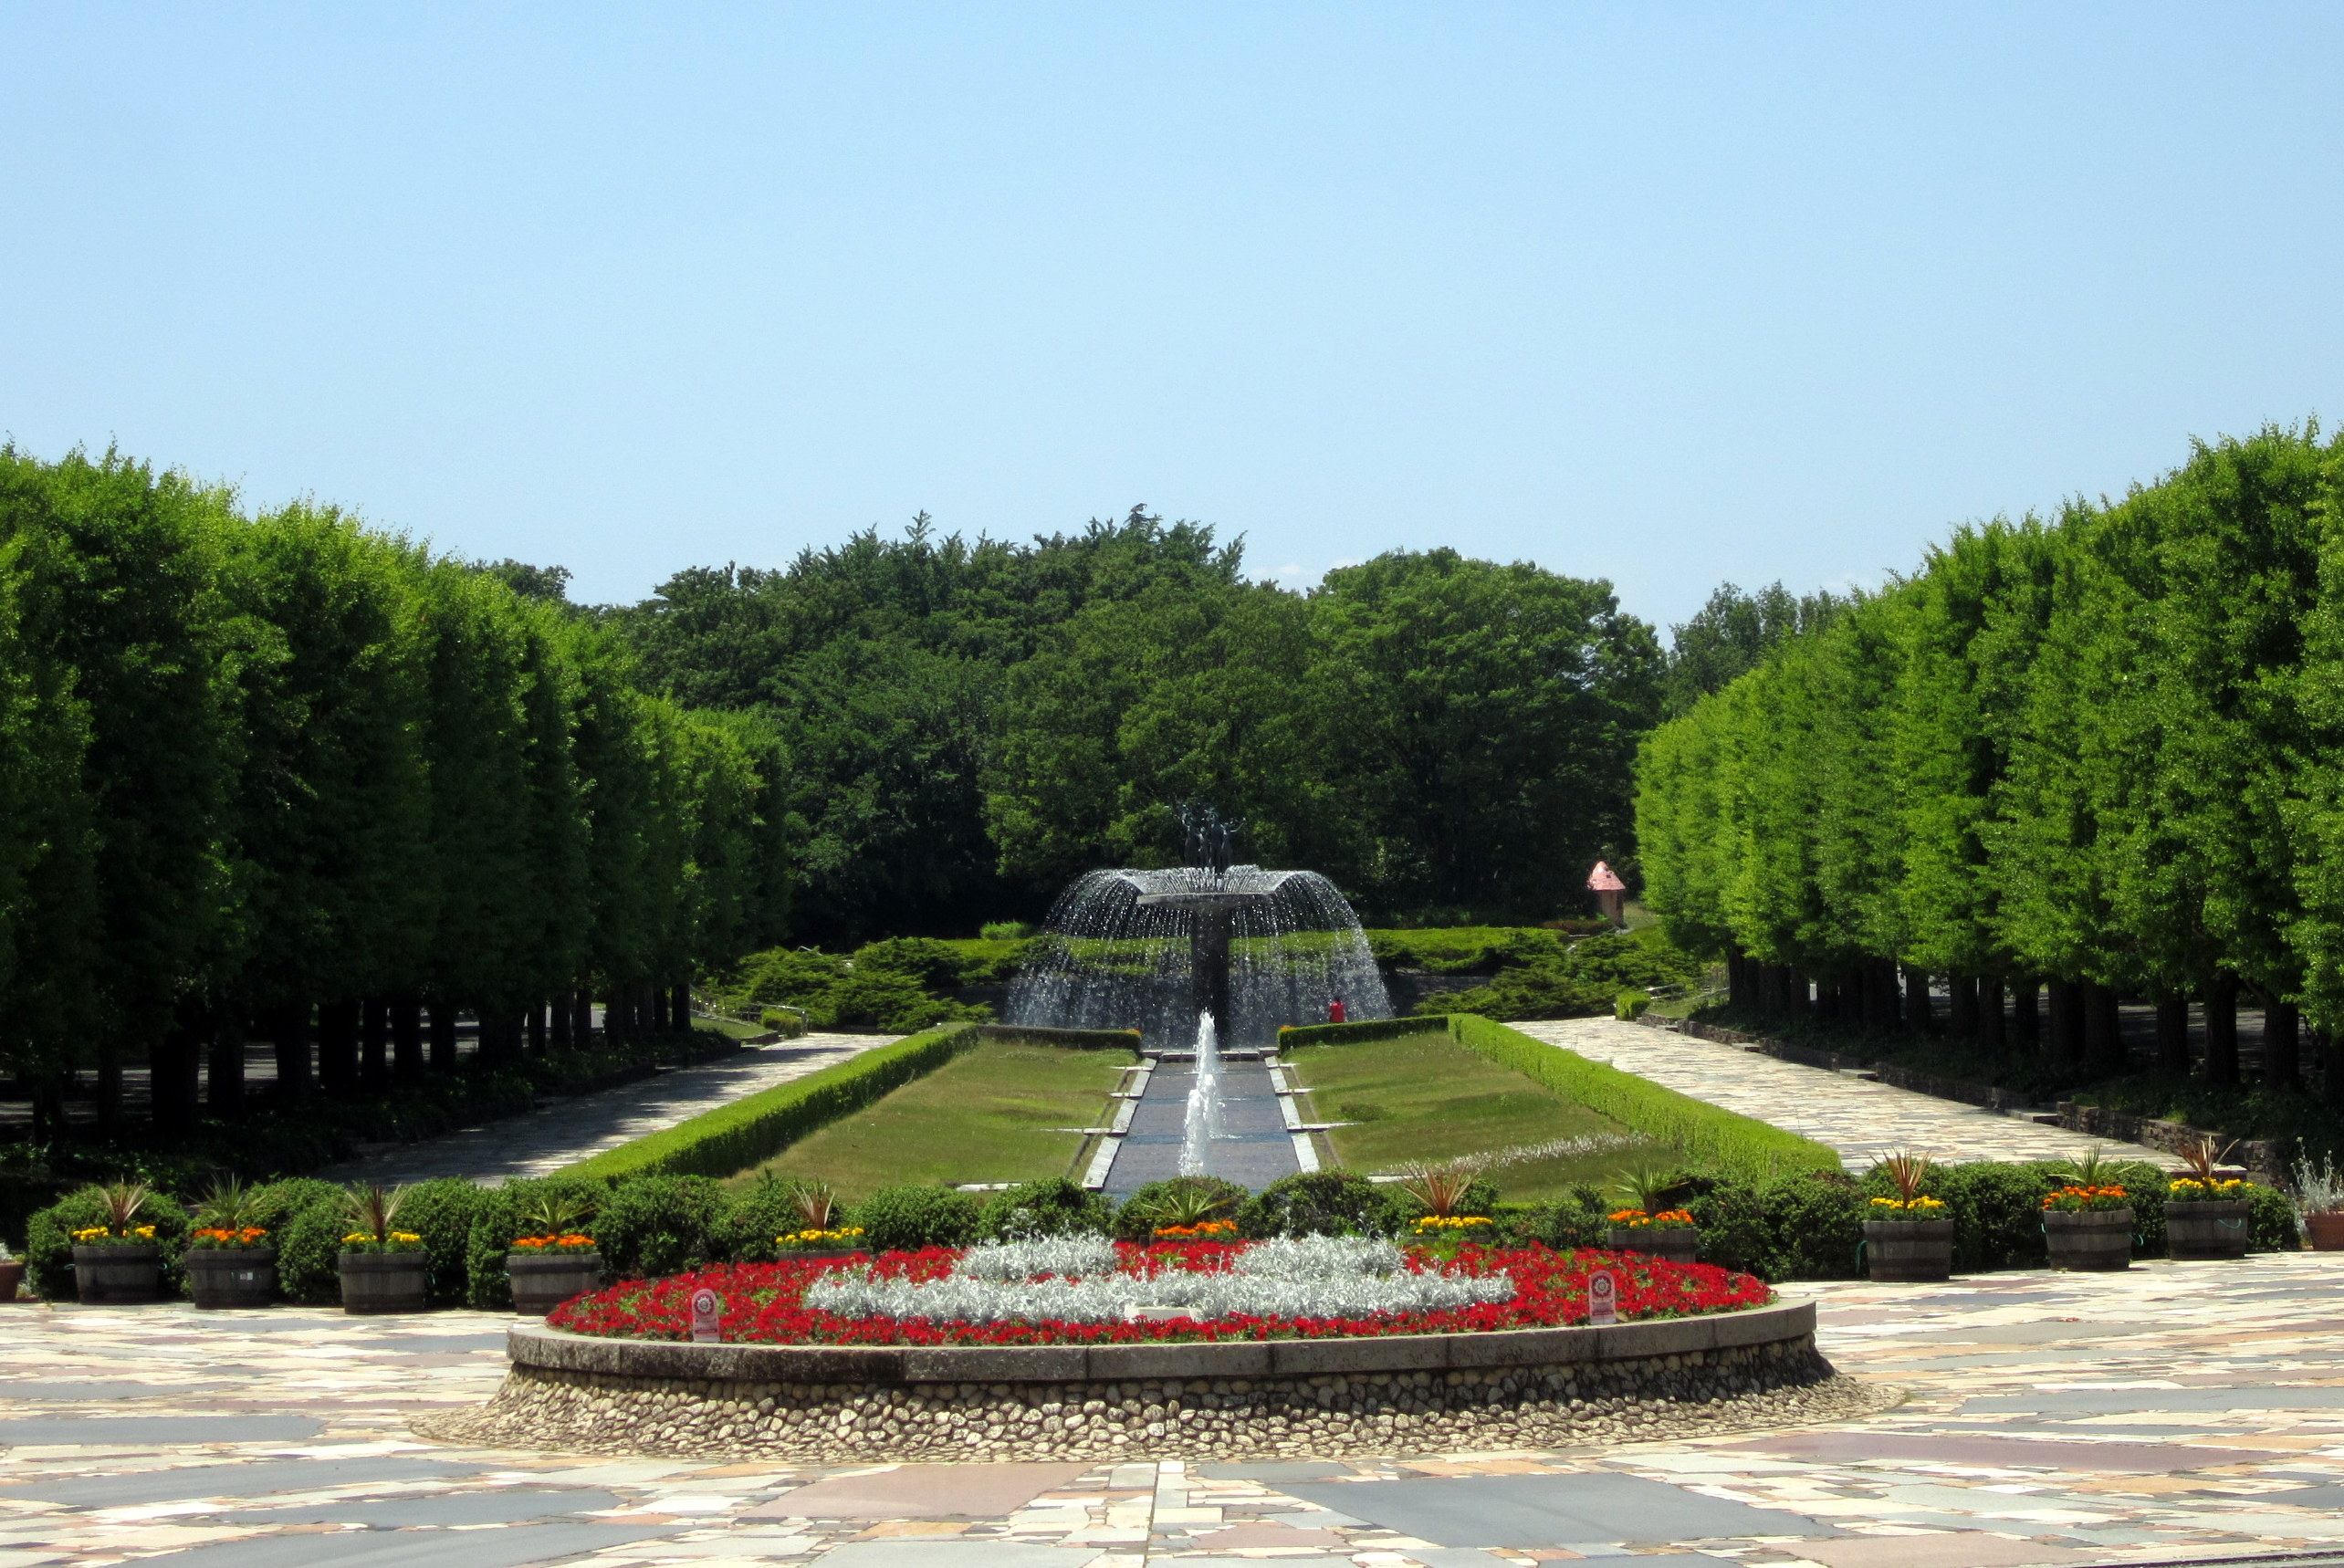 Showa Kinen Park: Free Family Fun in Tachikawa